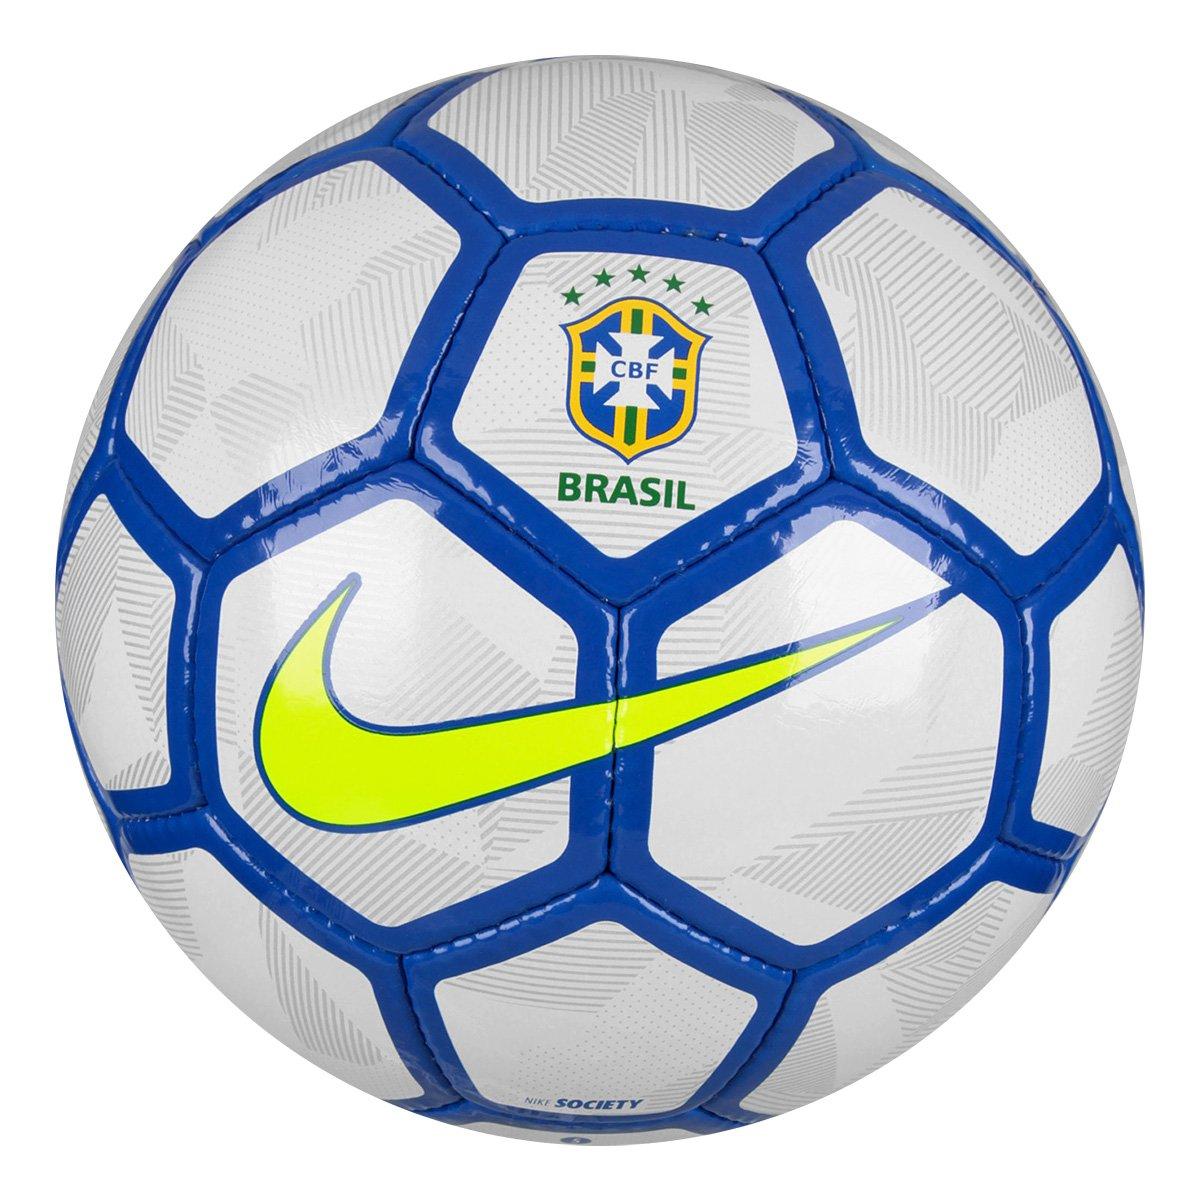 d1ad1c63c1 Bola Futebol Society Nike CBF Brasil - Compre Agora